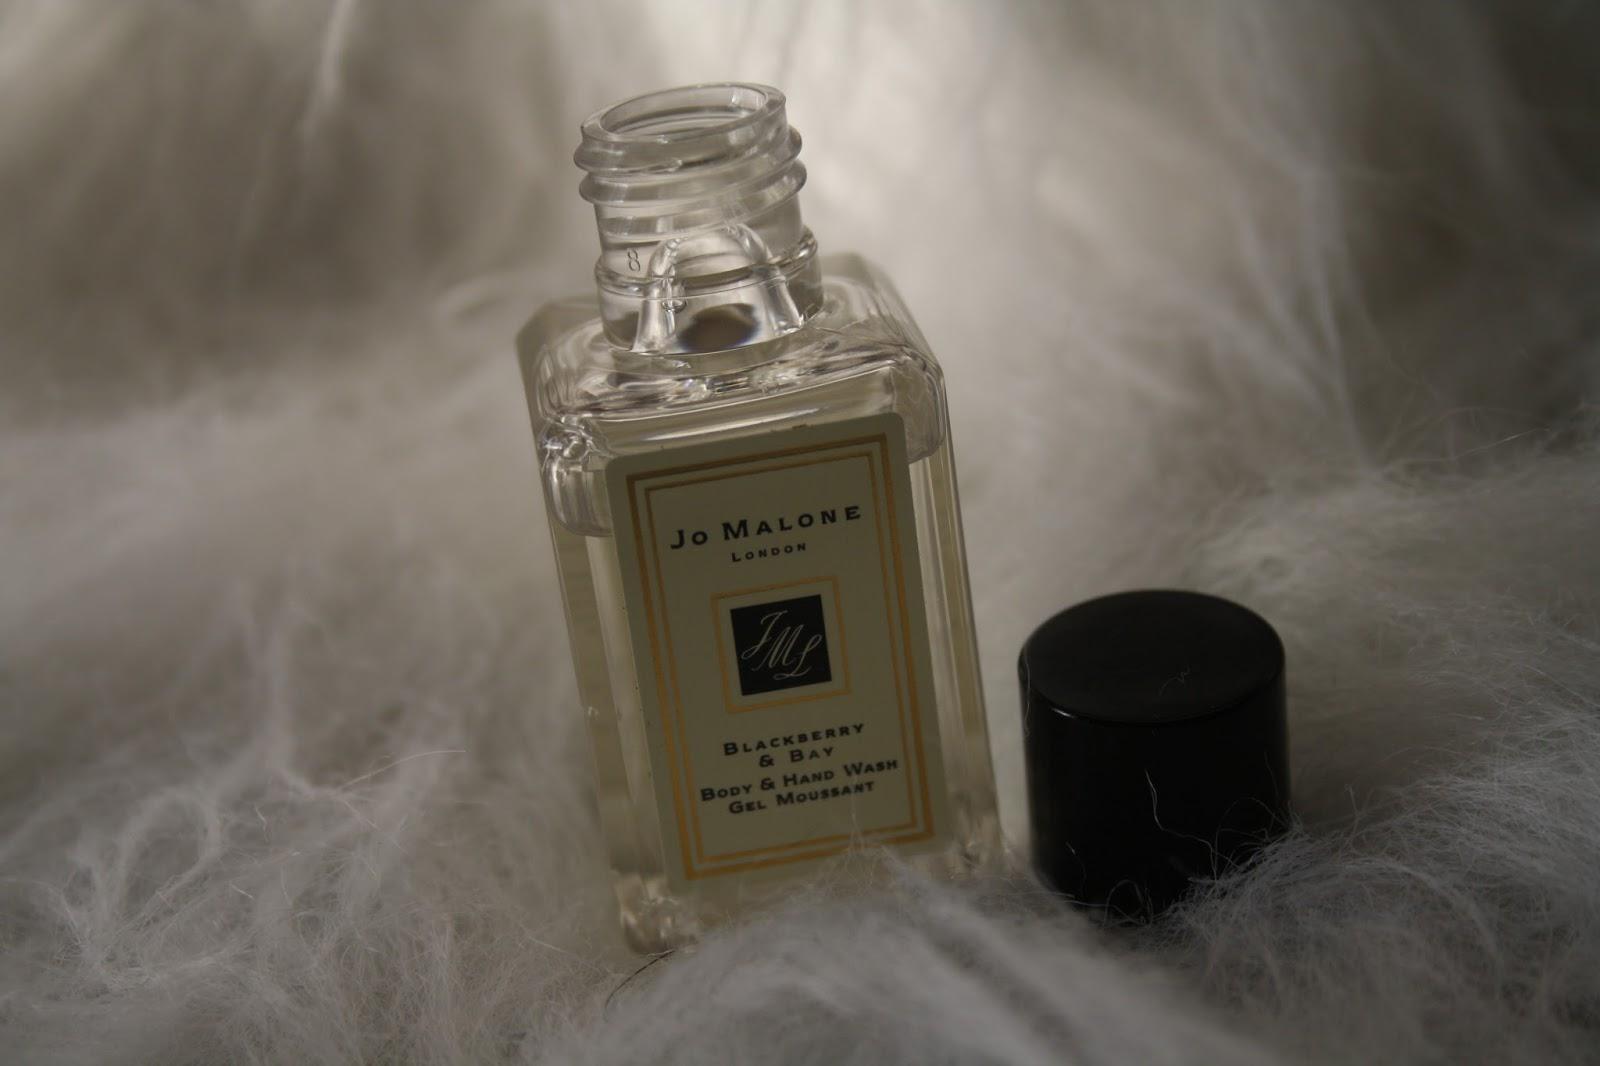 Jo Malone Blackberry & Bay Body and Hand Wash